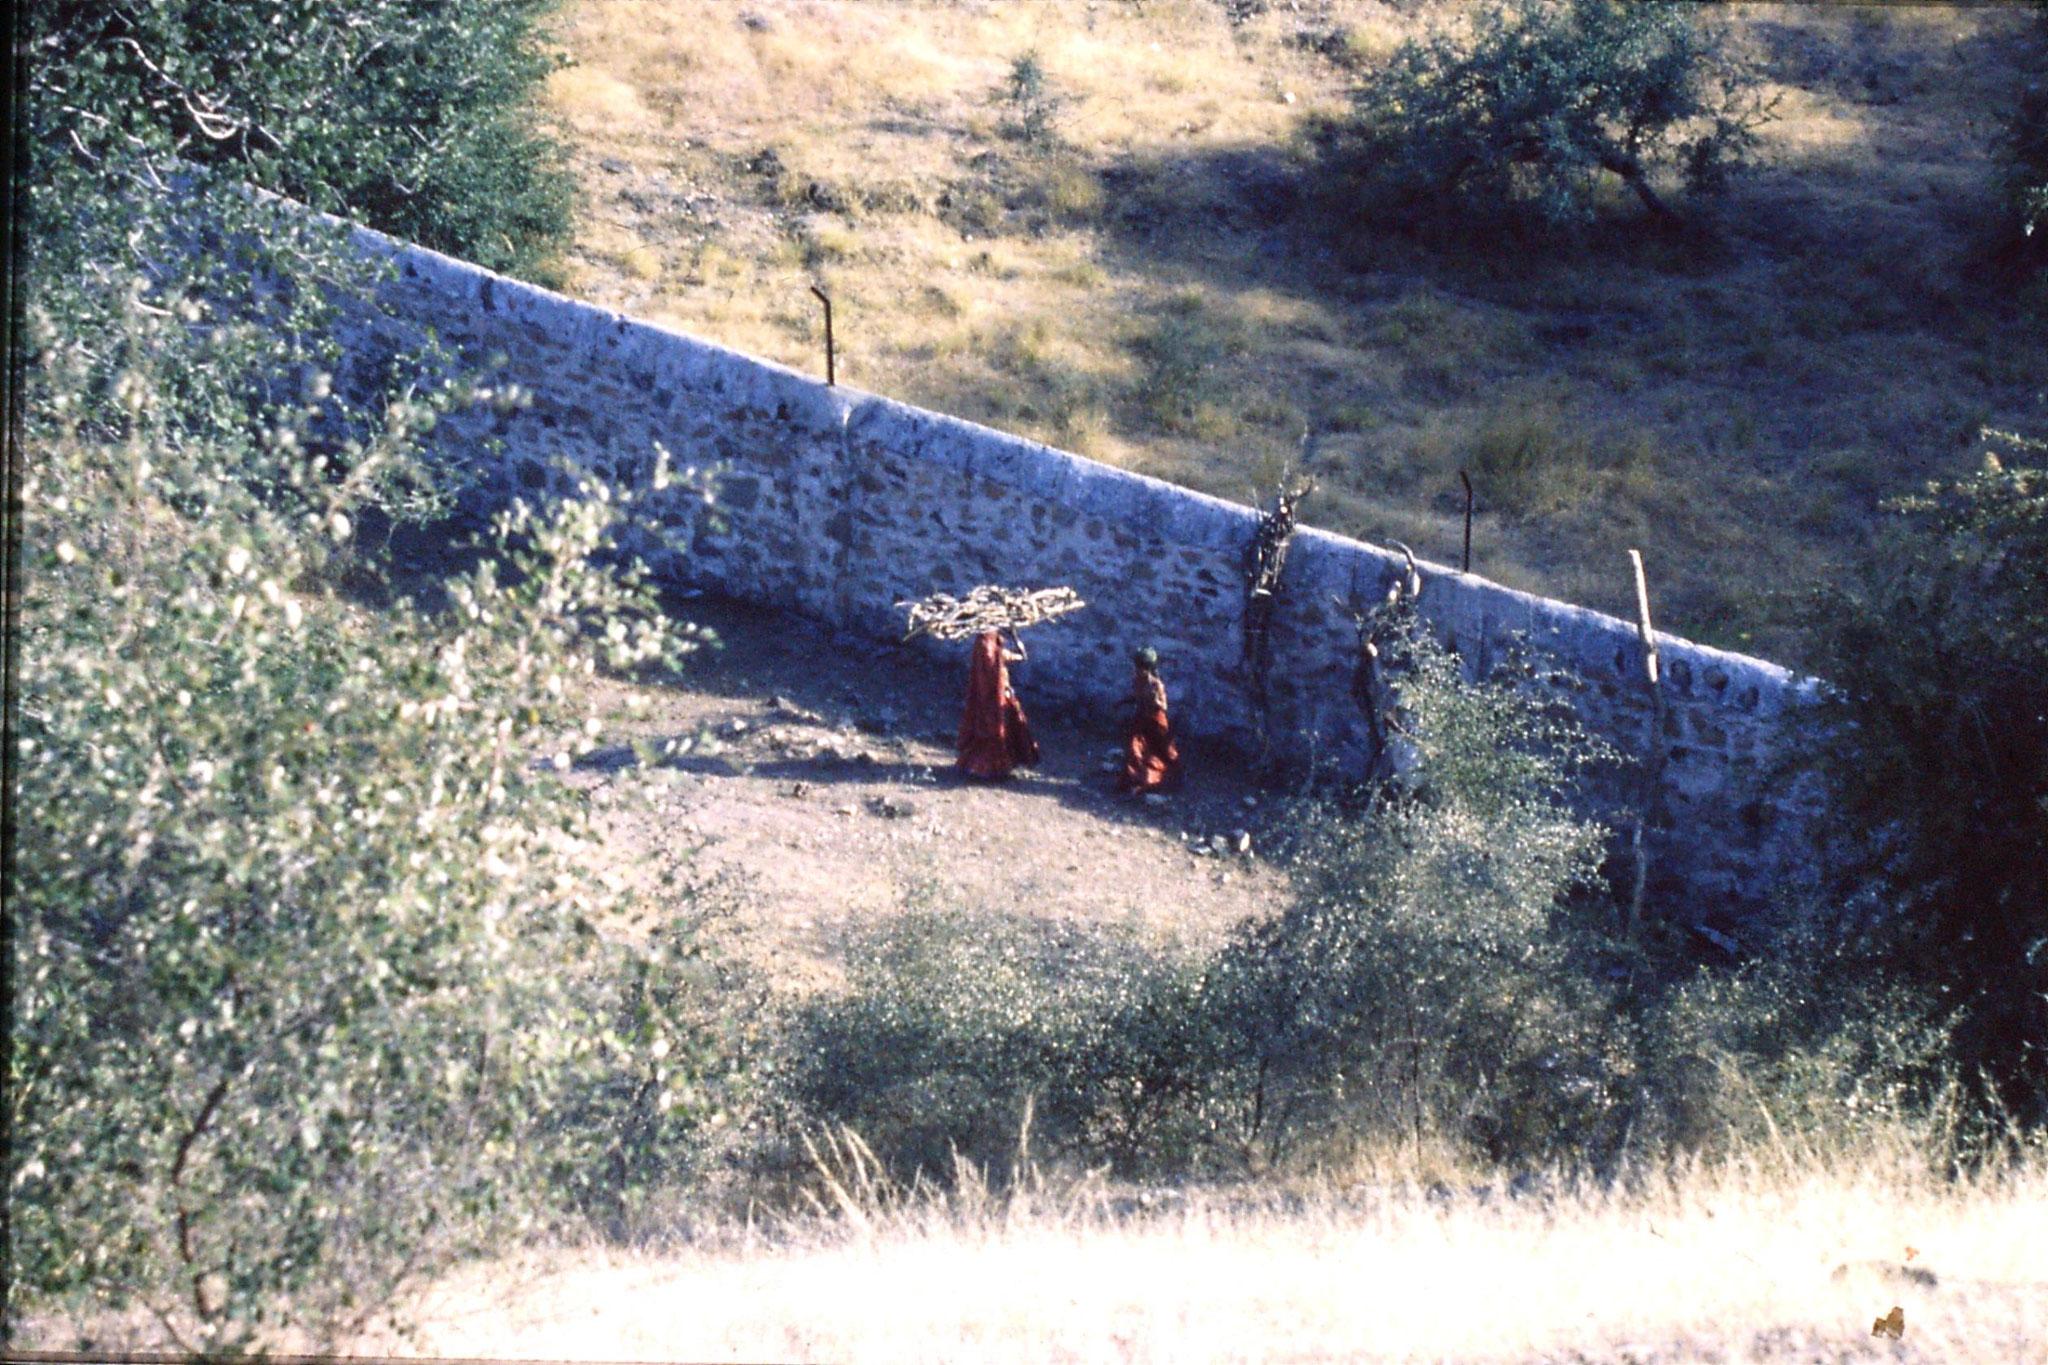 6/12/1989: 21: Ranakpur